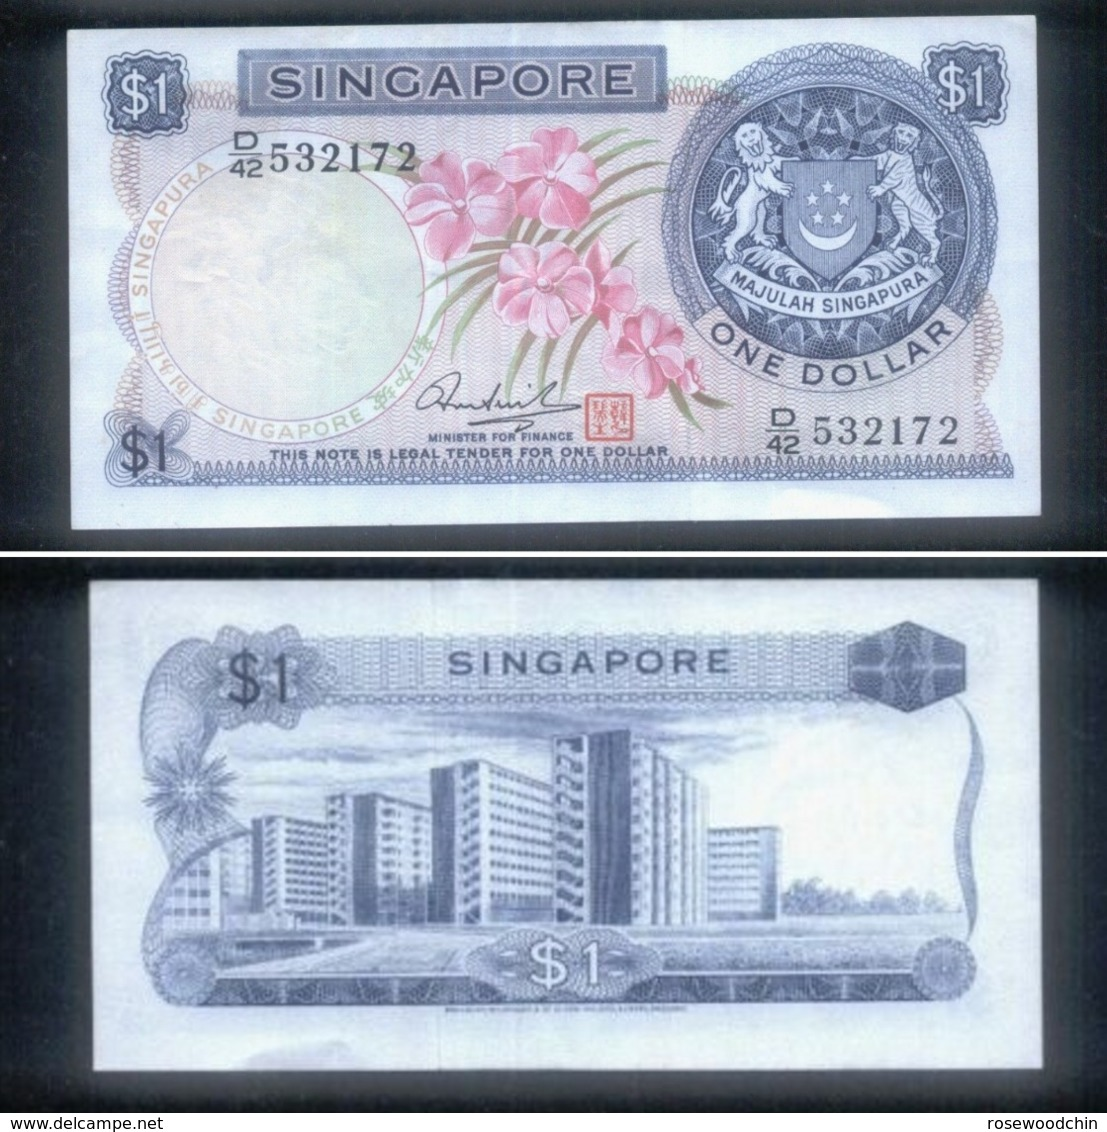 RARE ! SINGAPORE 1 DOLLAR ORCHIDS CURRENCY MONEY BANKNOTE (#143E) AU - Singapore